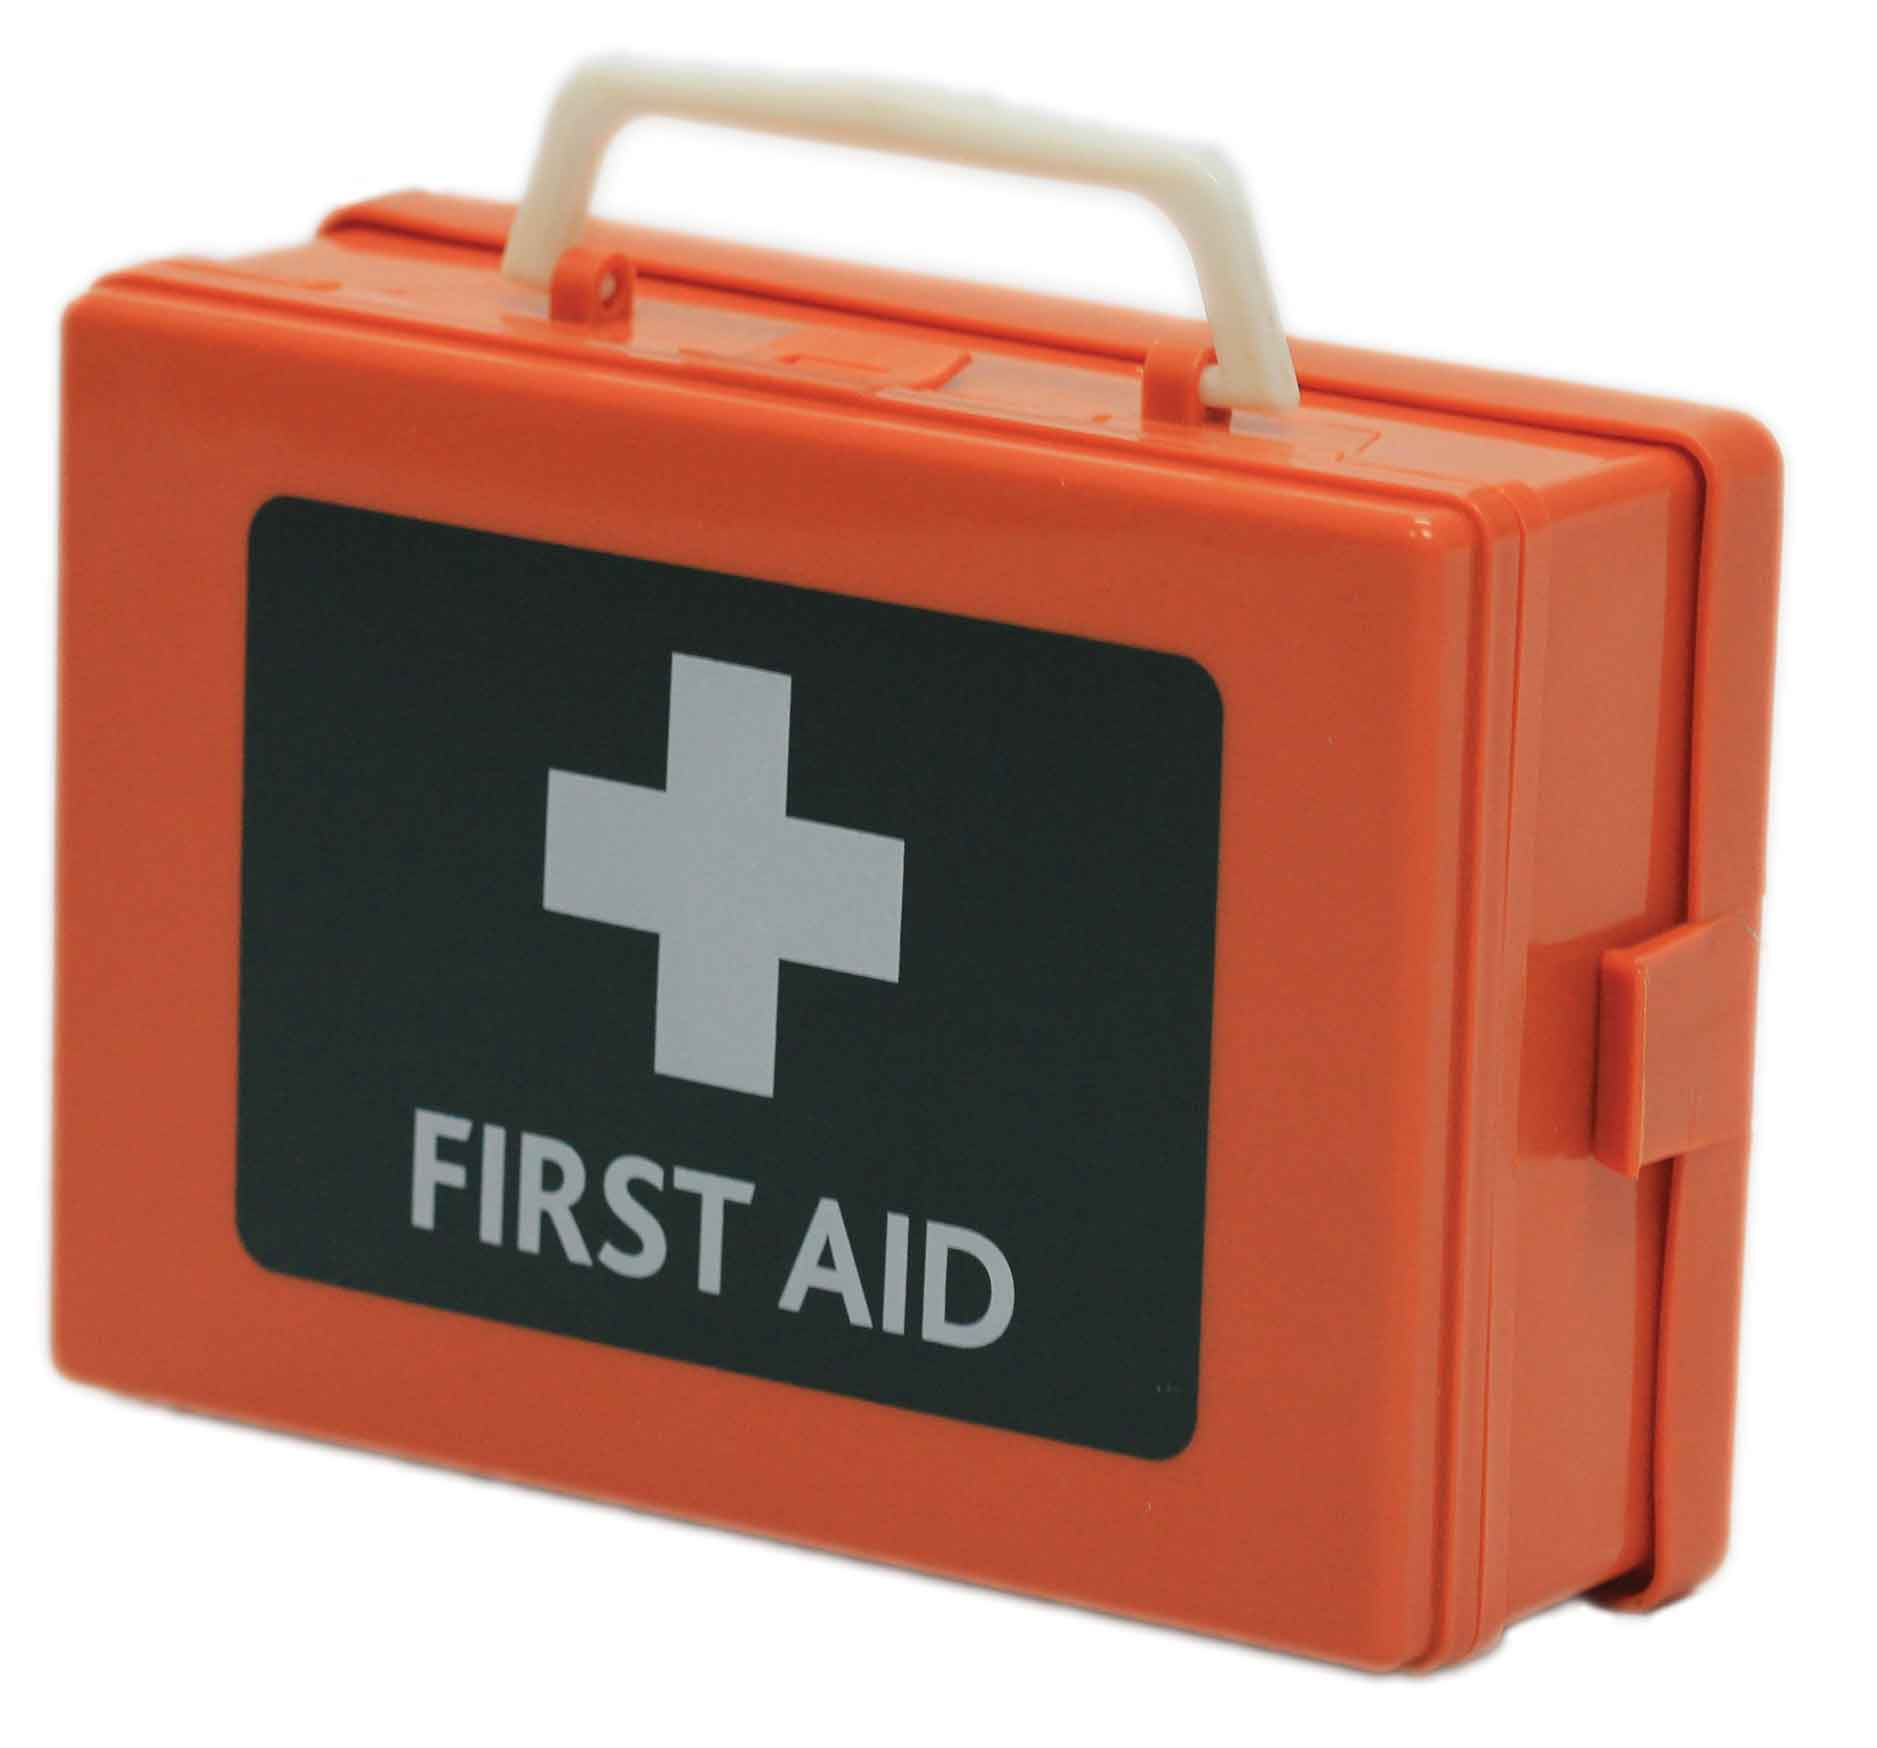 Northrock Safety Orange First Aid Box First Aid Box